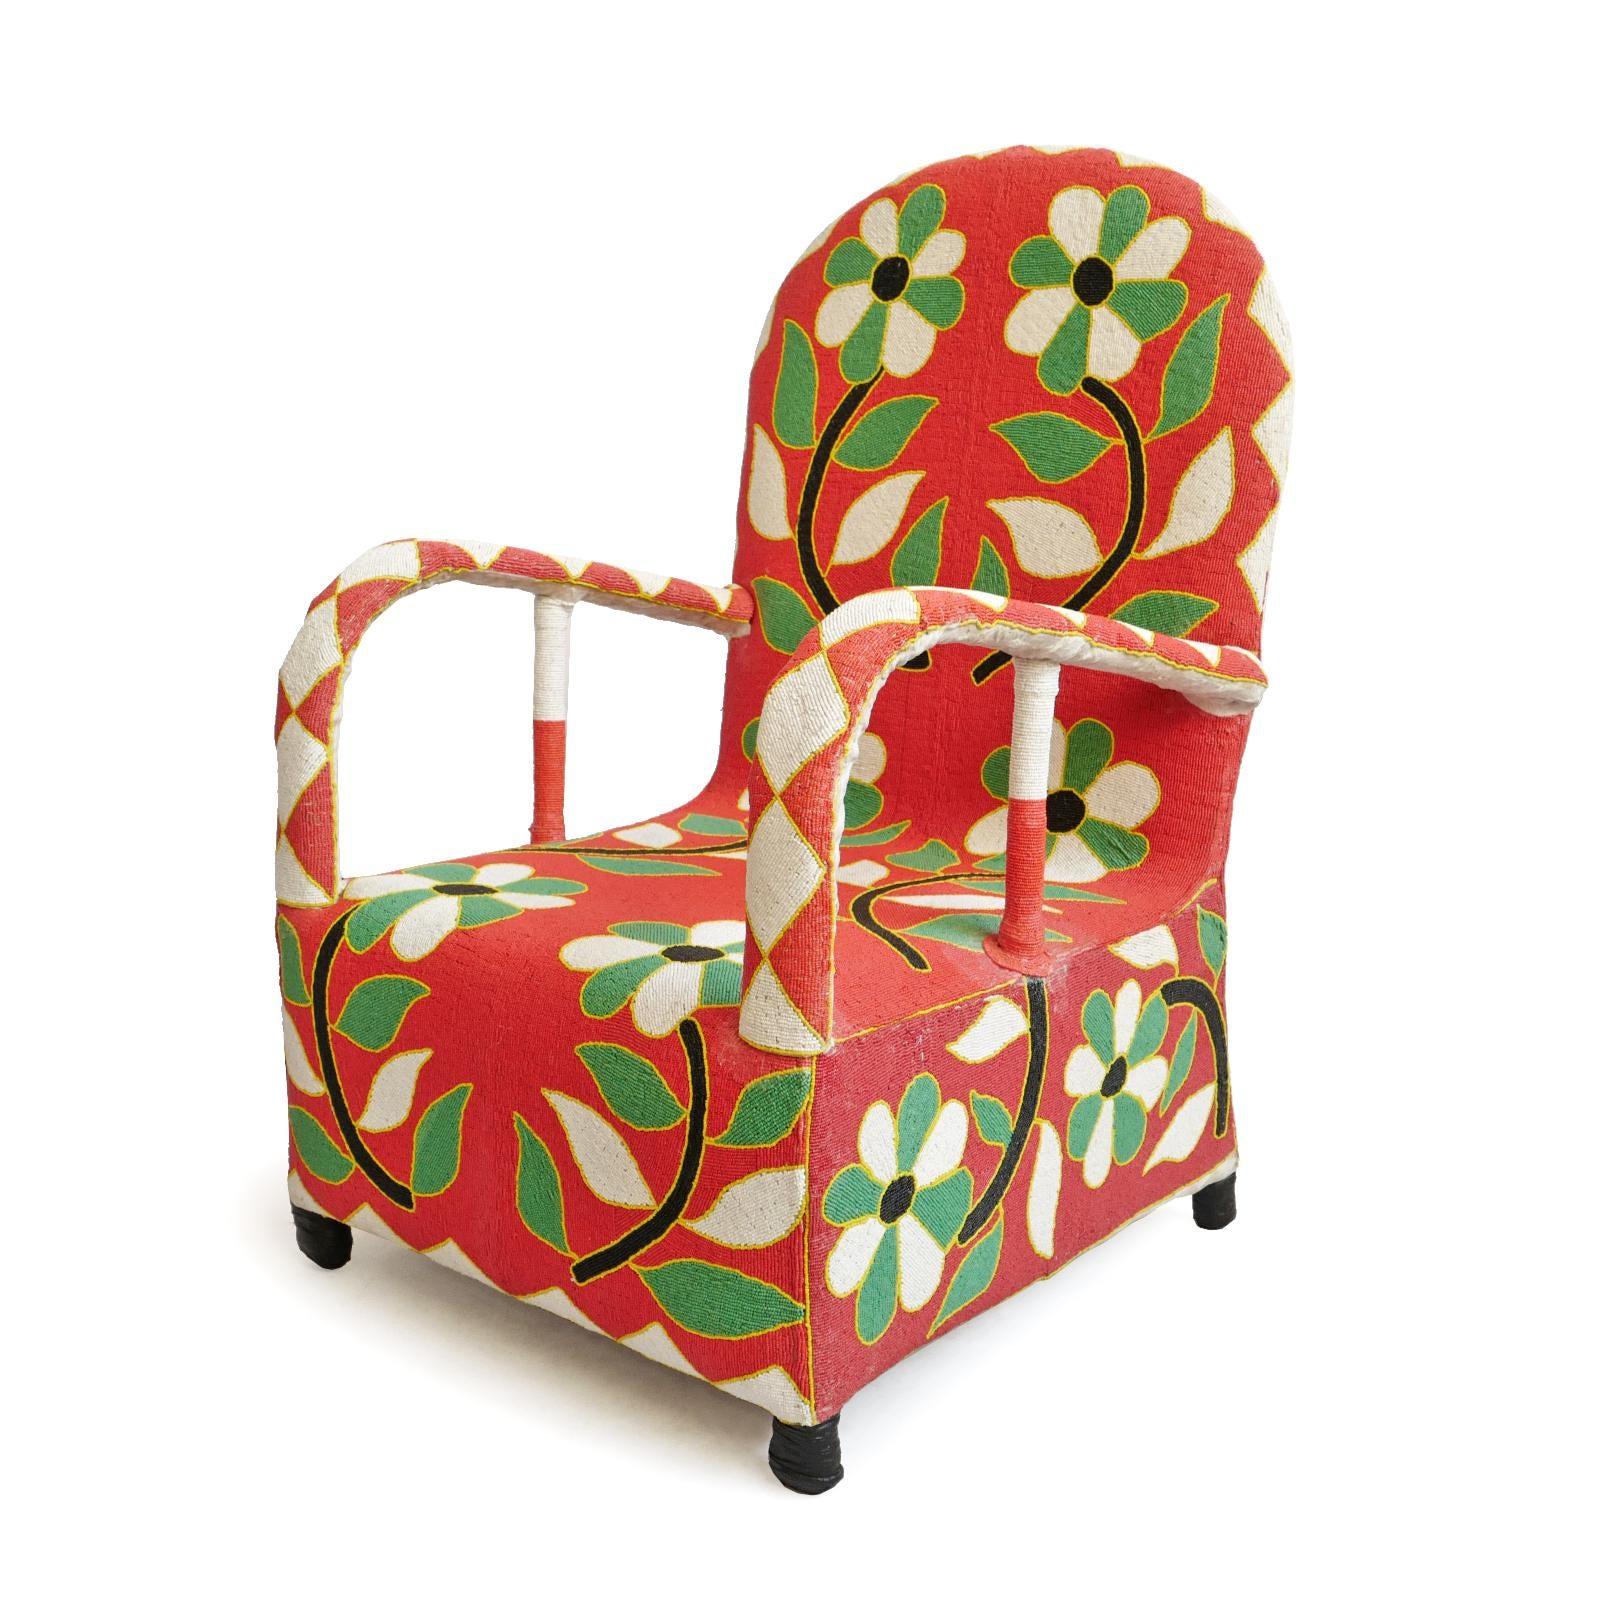 swivel chair nigeria ergonomic rental yoruba nigerian beaded chief chairish for sale image 4 of 10